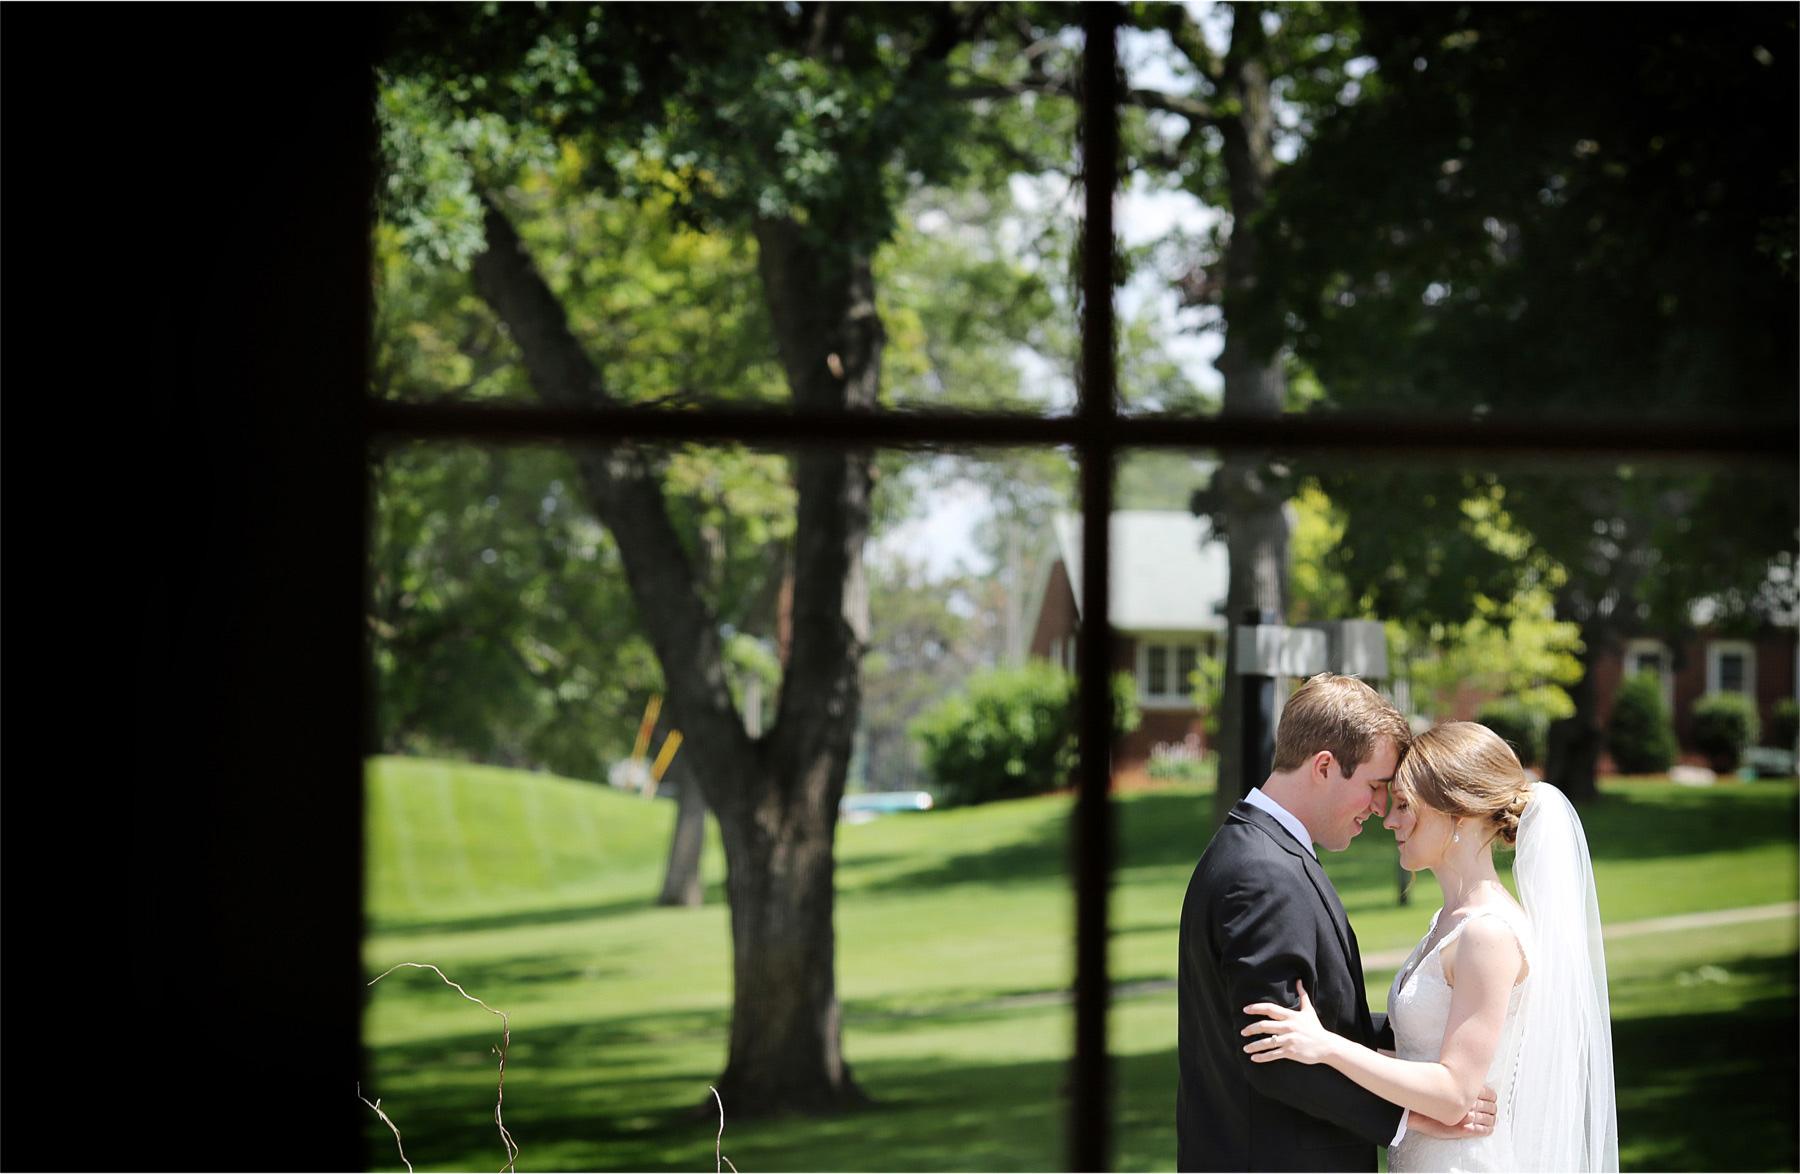 06-Edina-Minnesota-Wedding-Photographer-by-Andrew-Vick-Photography-Summer-Our-Lady-of-Grace-Catholic-Parish-Church-Bride-Groom-First-Look-Meeting-Window-Embrace-Betsy-and-Jon.jpg